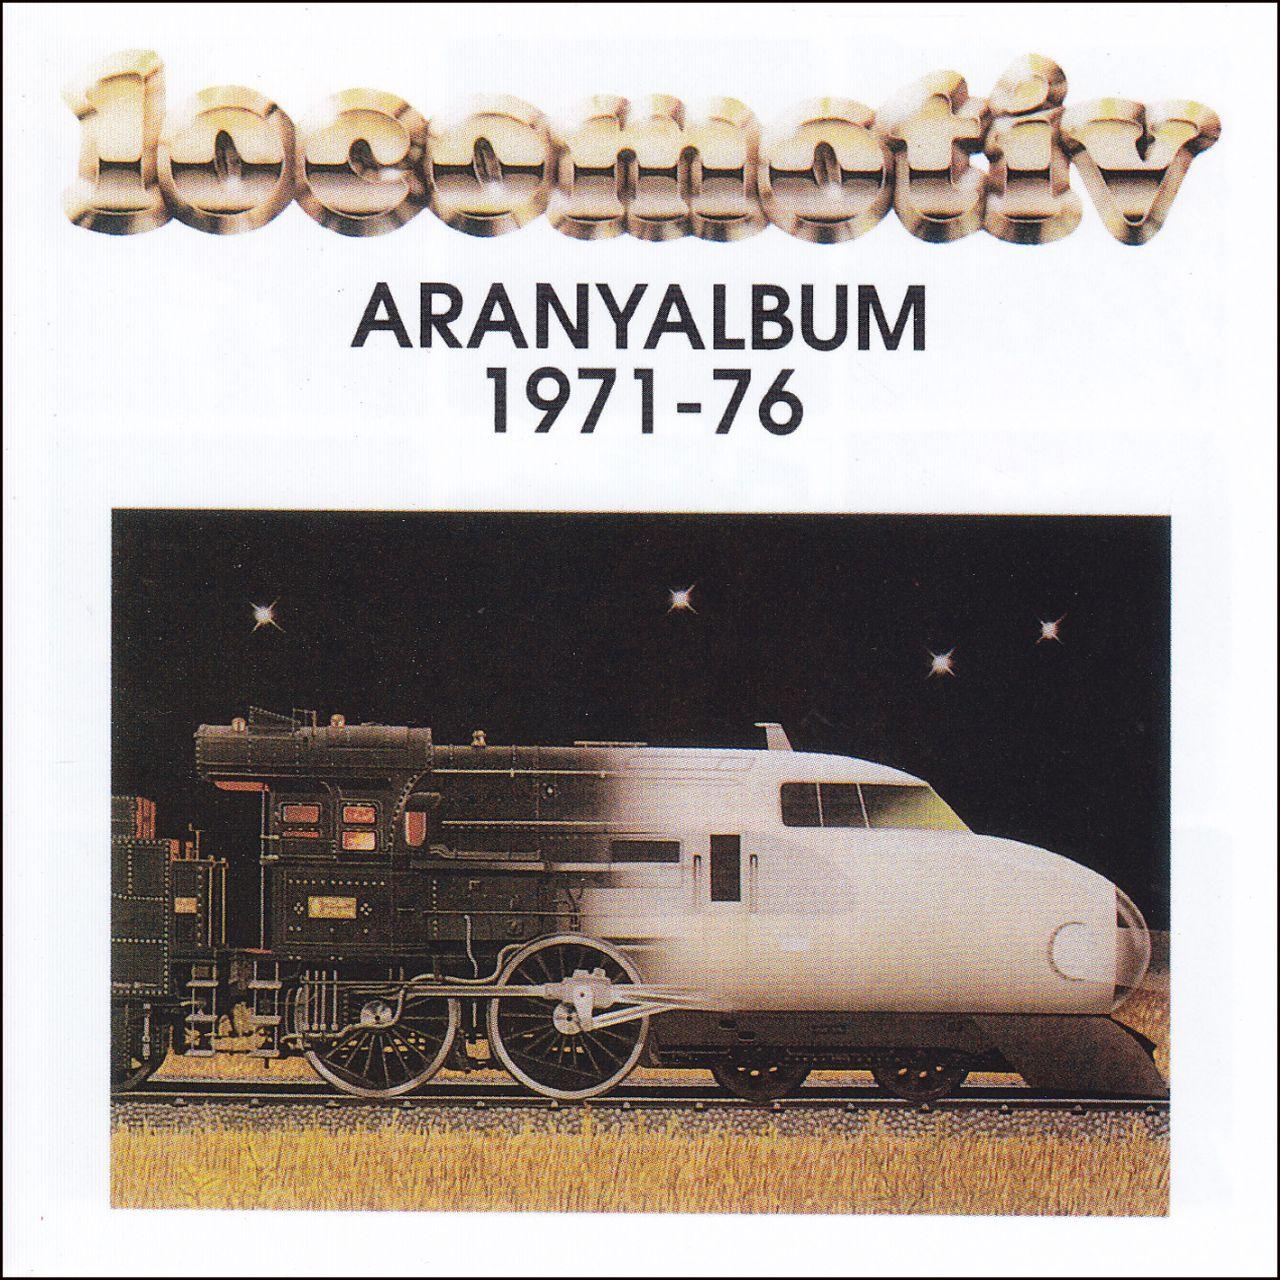 Locomotiv: Aranyalbum 1971 - 76 (CD)